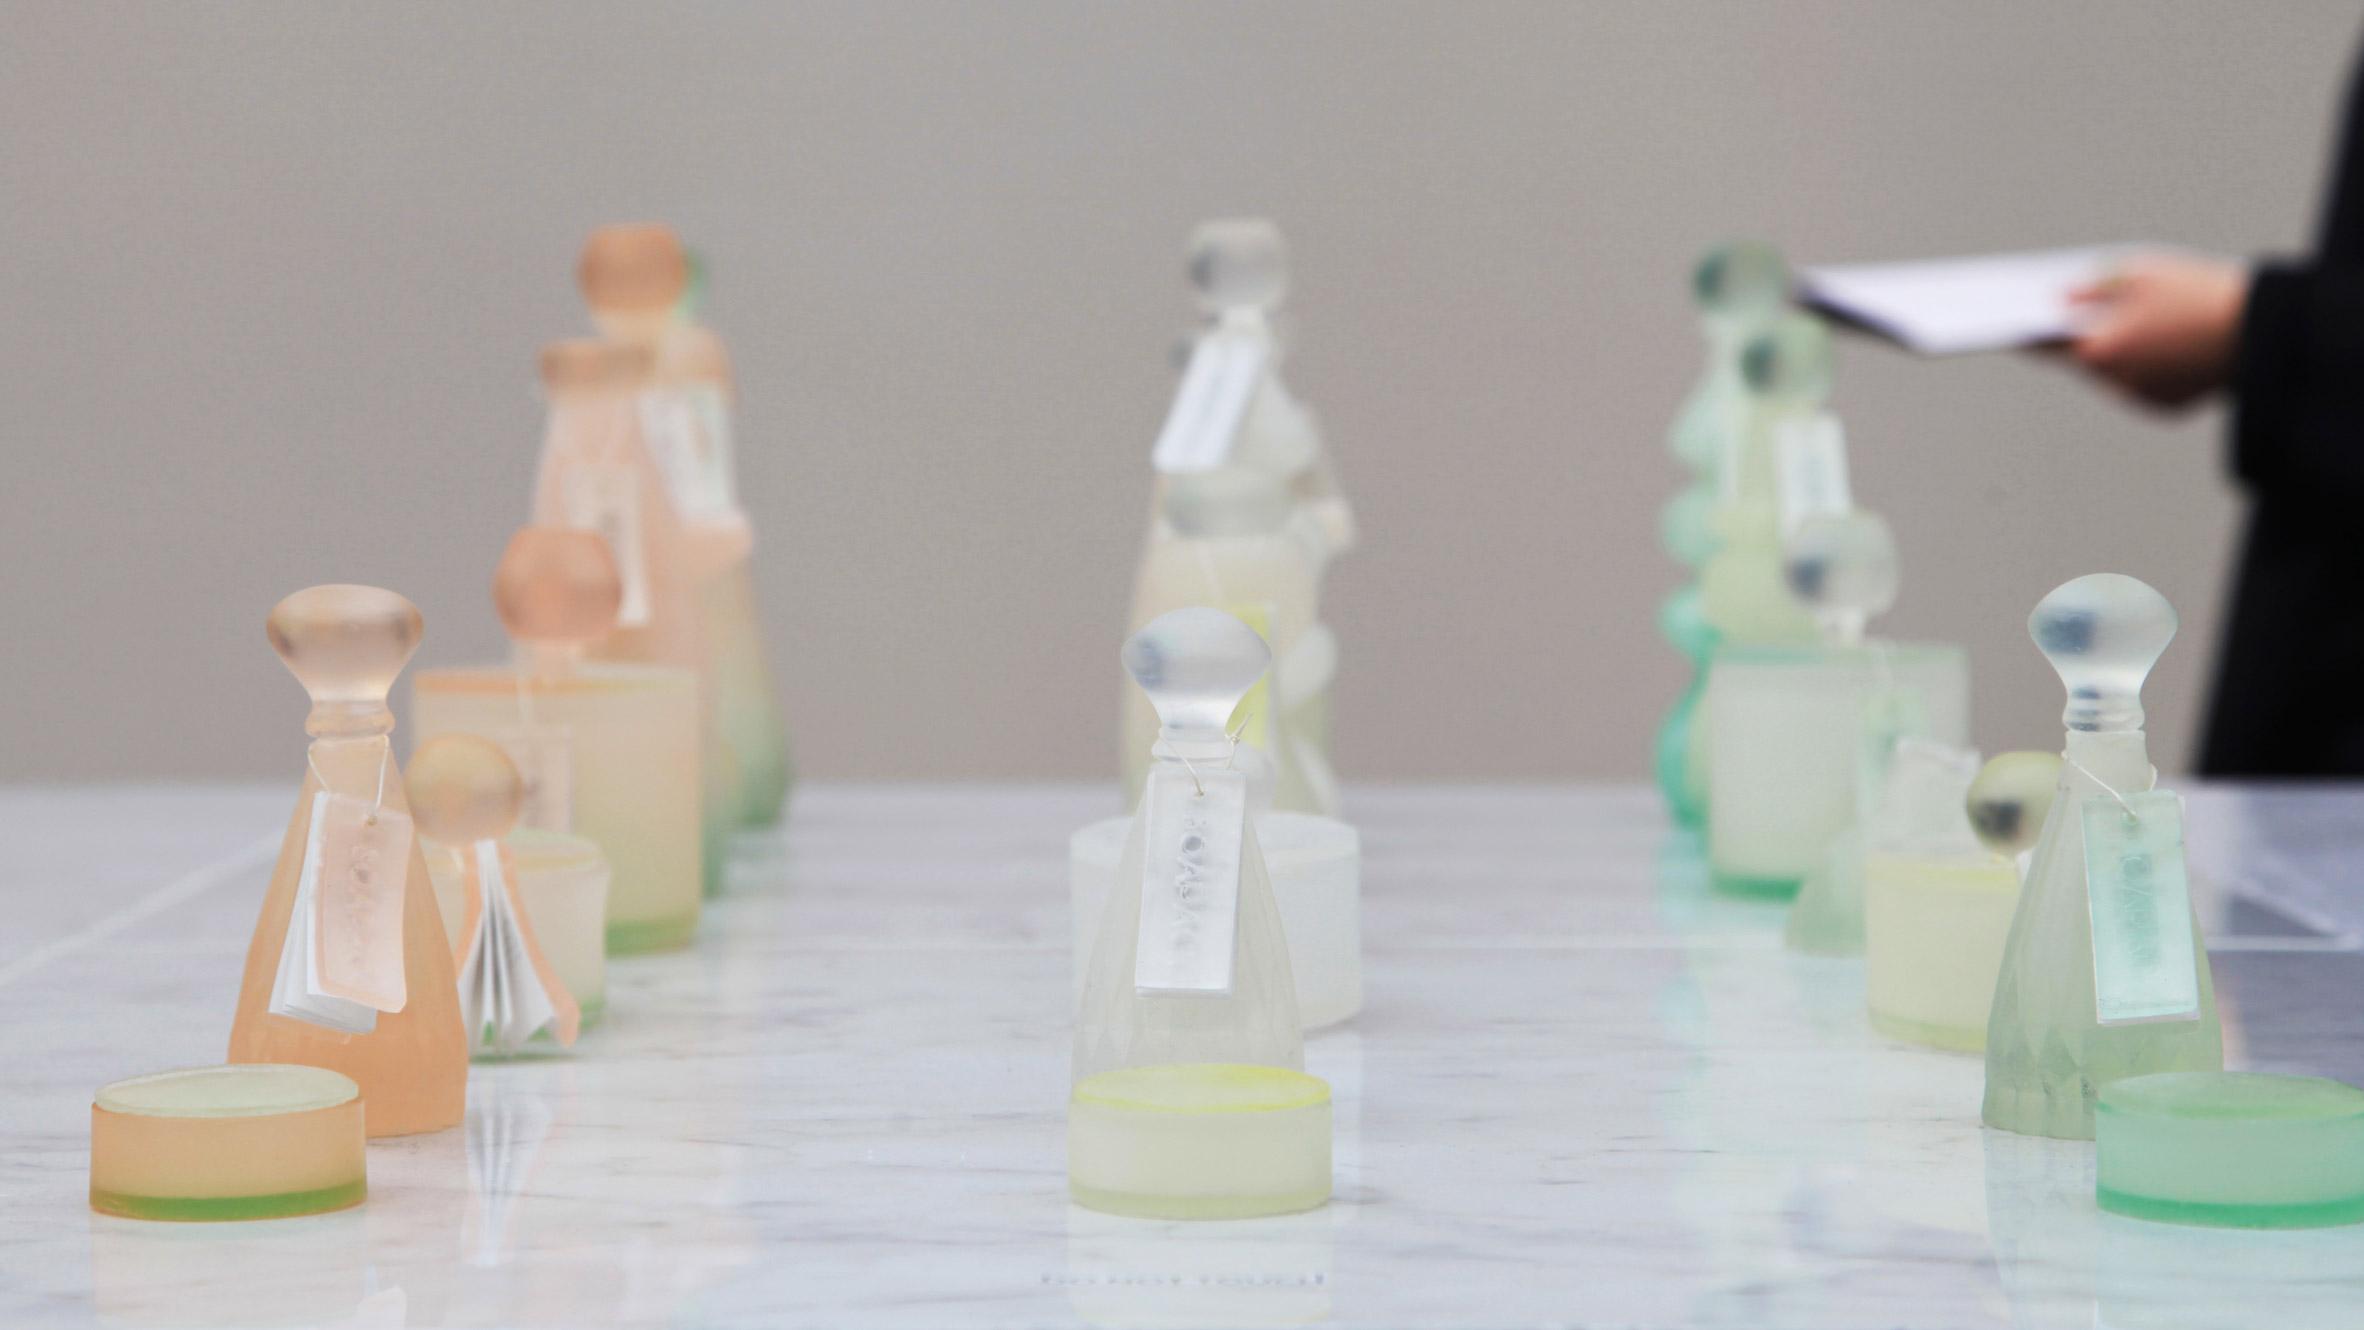 soapack-mi-zhou-sustainable-packaging_dezeen_2364_hero_a